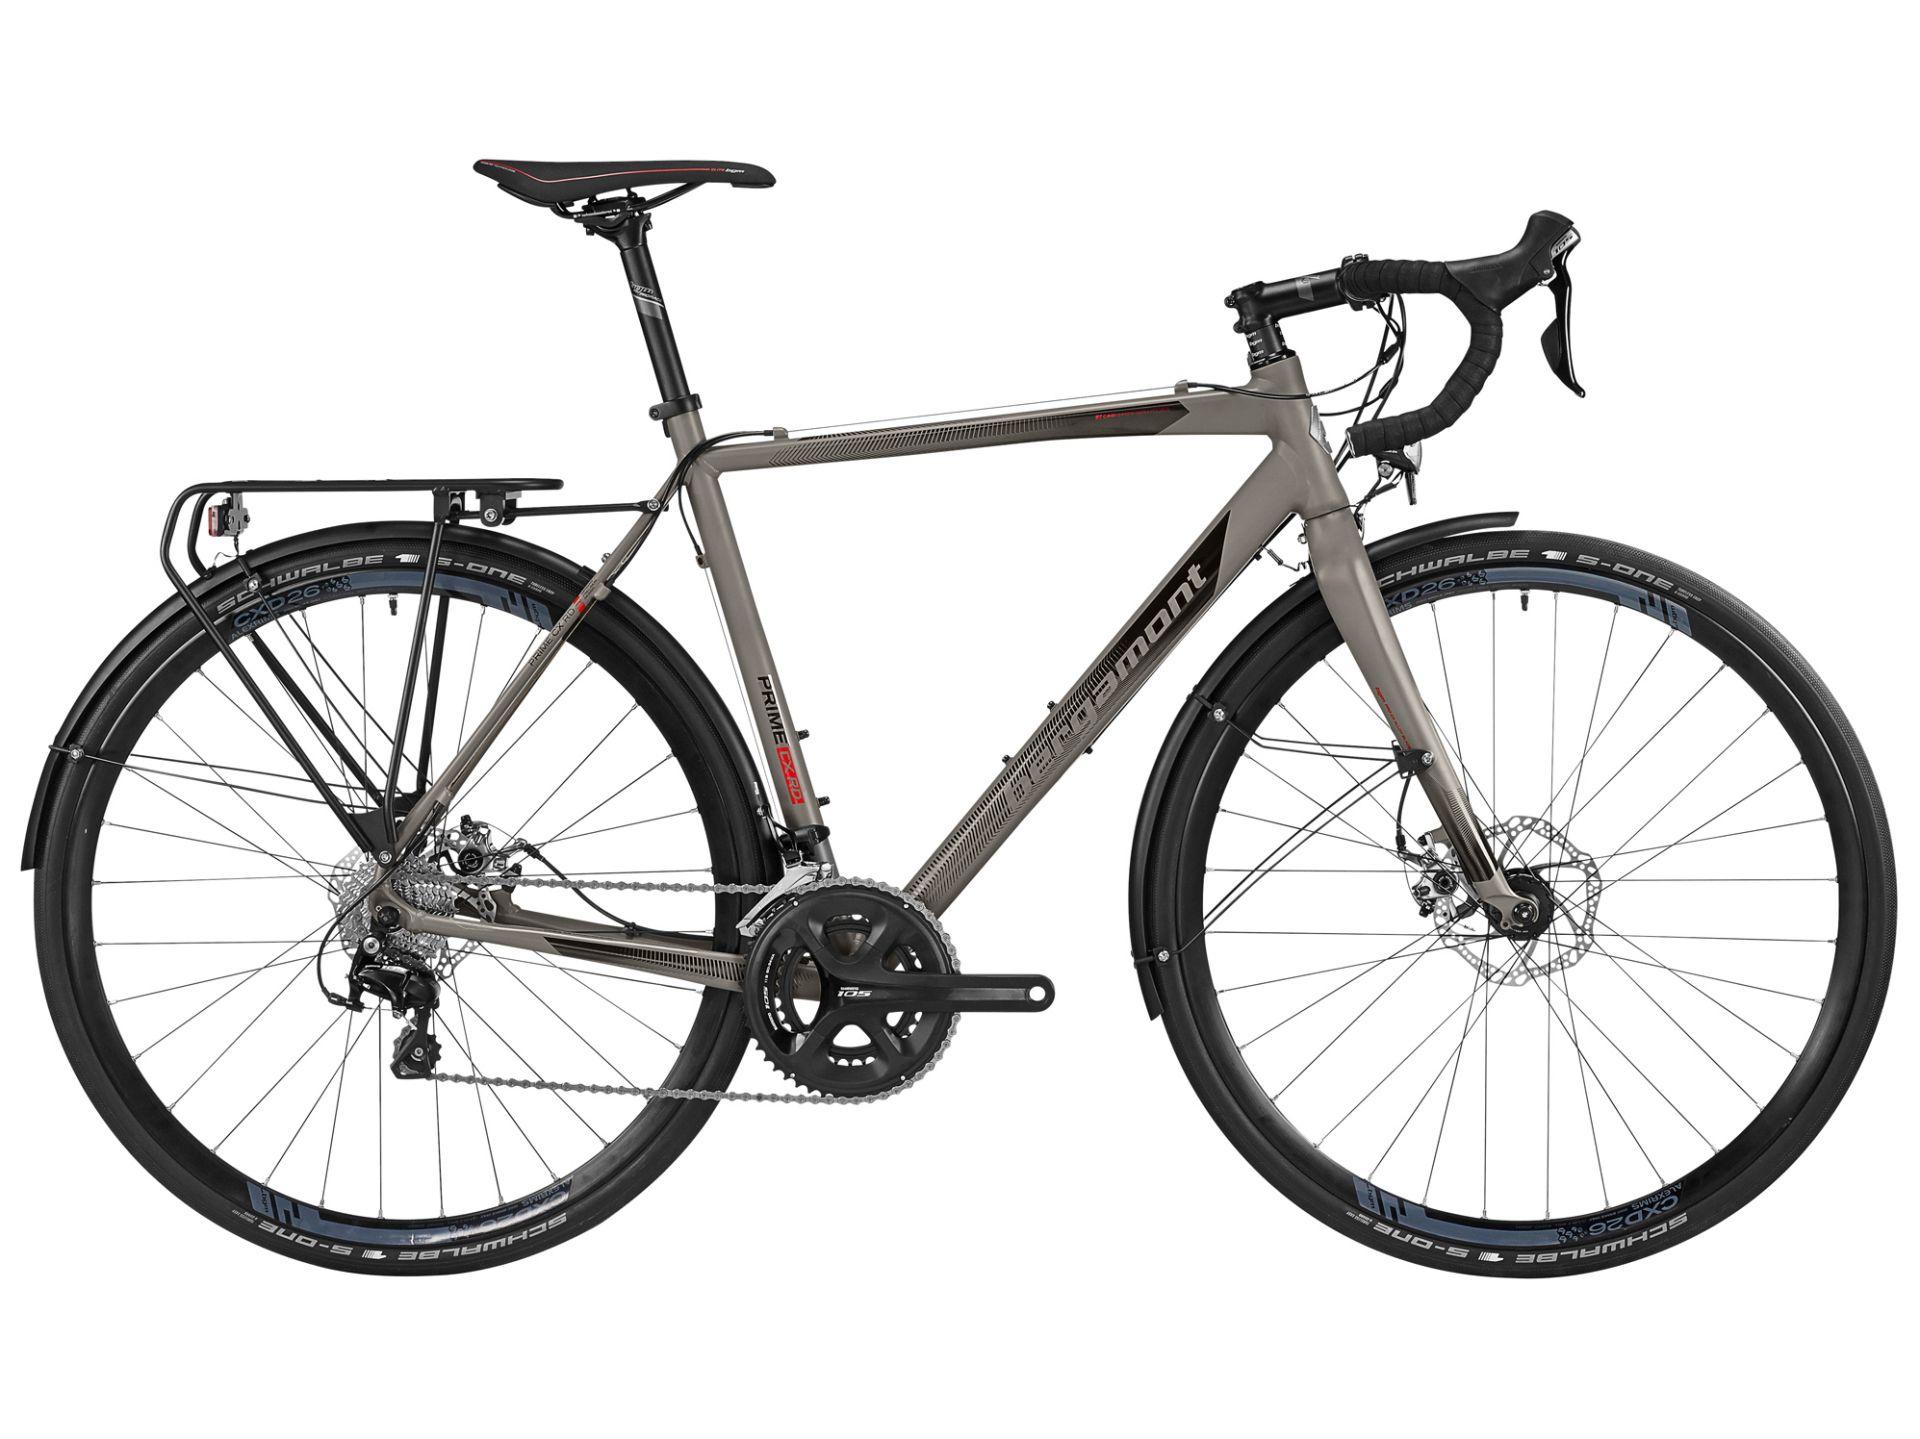 Vélo gravel/aventure Bergamont Prime CX RD 2016 - 54 cm